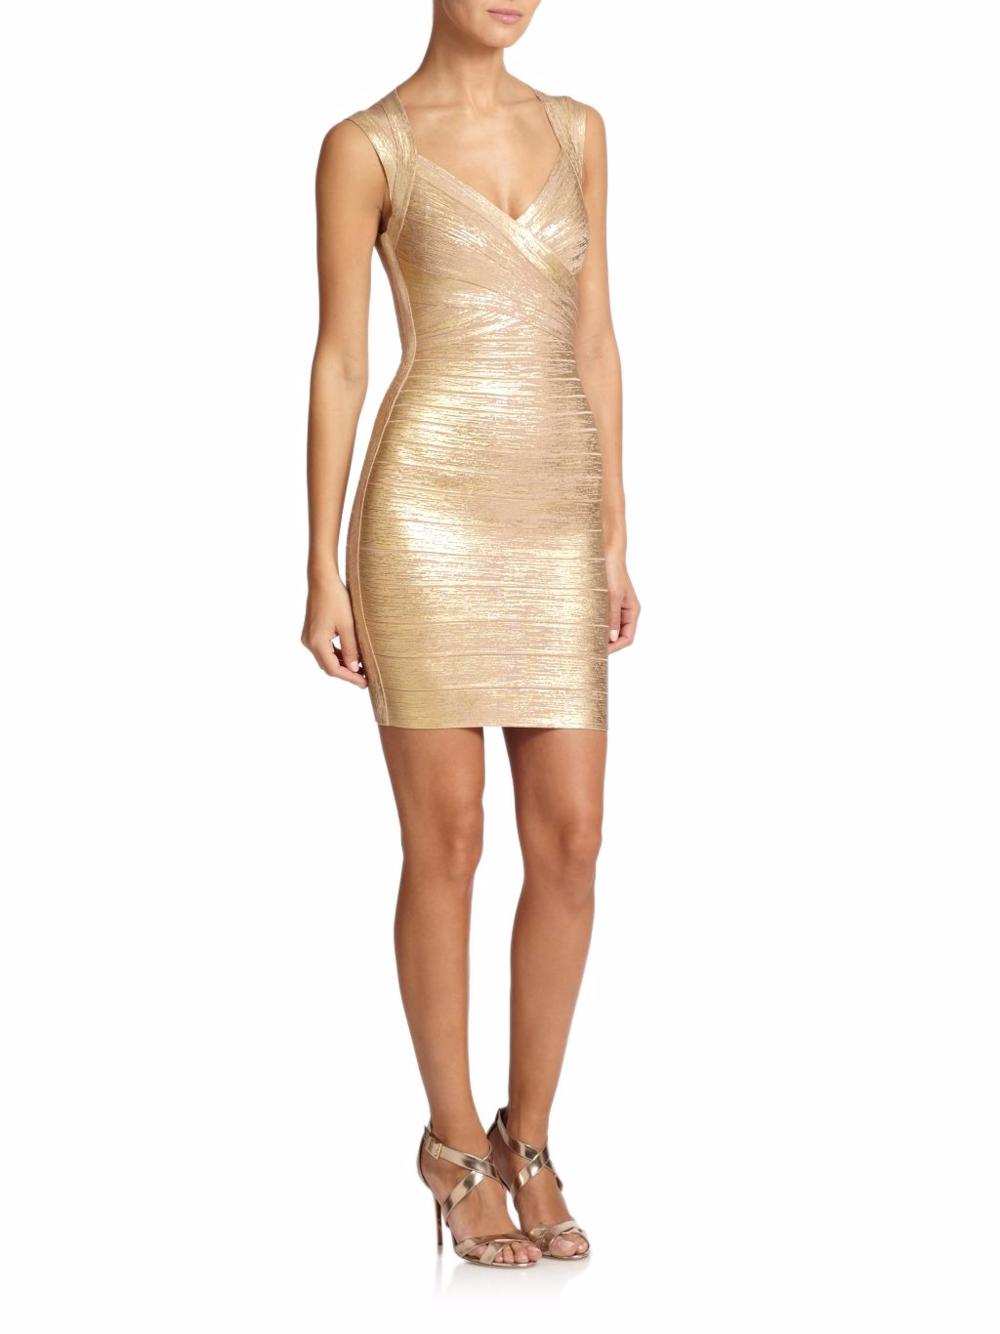 herve leger gold dress